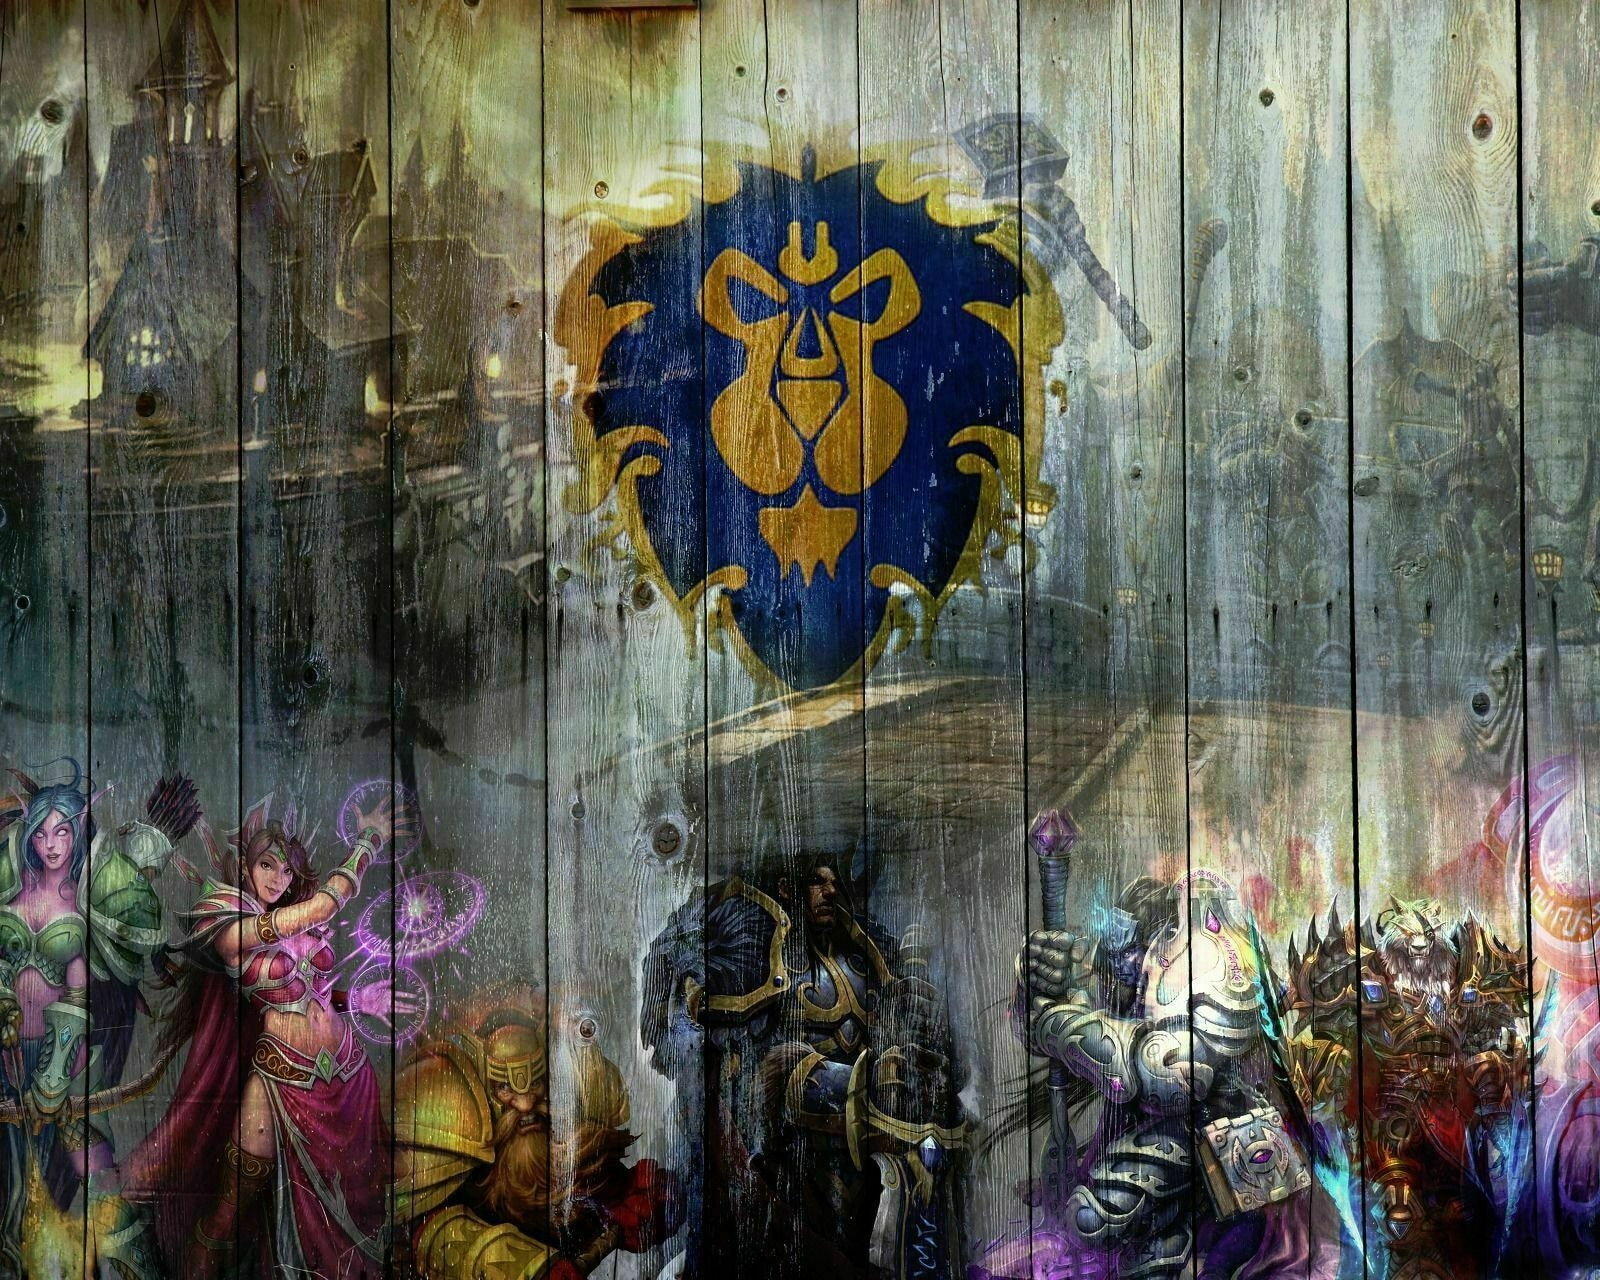 World of Warcraft Wow Alliance Art Film Print Silk Poster Home Wall Decor 24x36inch